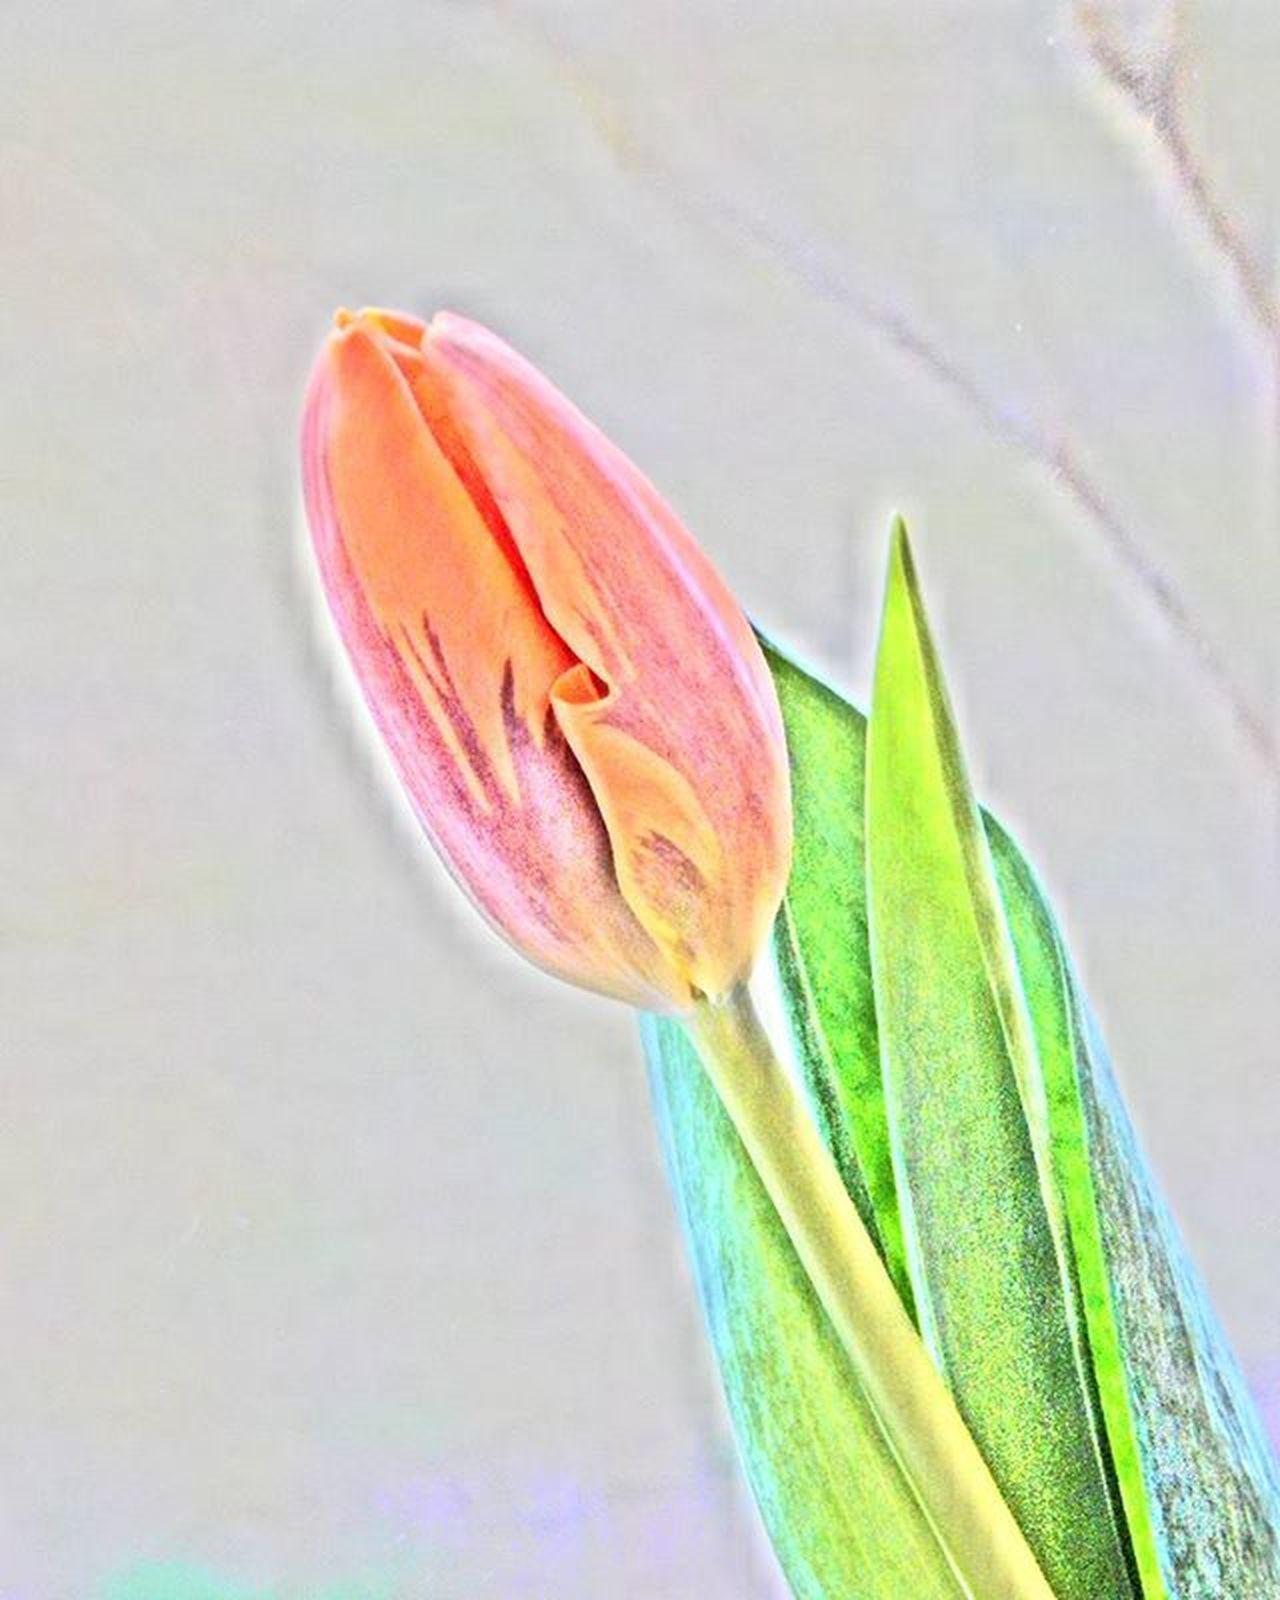 Tulpe Tulip Pavasaris Spring Fotofanatics_flowers_ Loves_flowers_ Loves_life Amateurs_shot Total_shot Ig_myshot Versatile_photo_ Prettiestpastels Flower Ziedi Latvija Fotocatchers Best_free_shot Global_ladies Global_beautiful_pictures